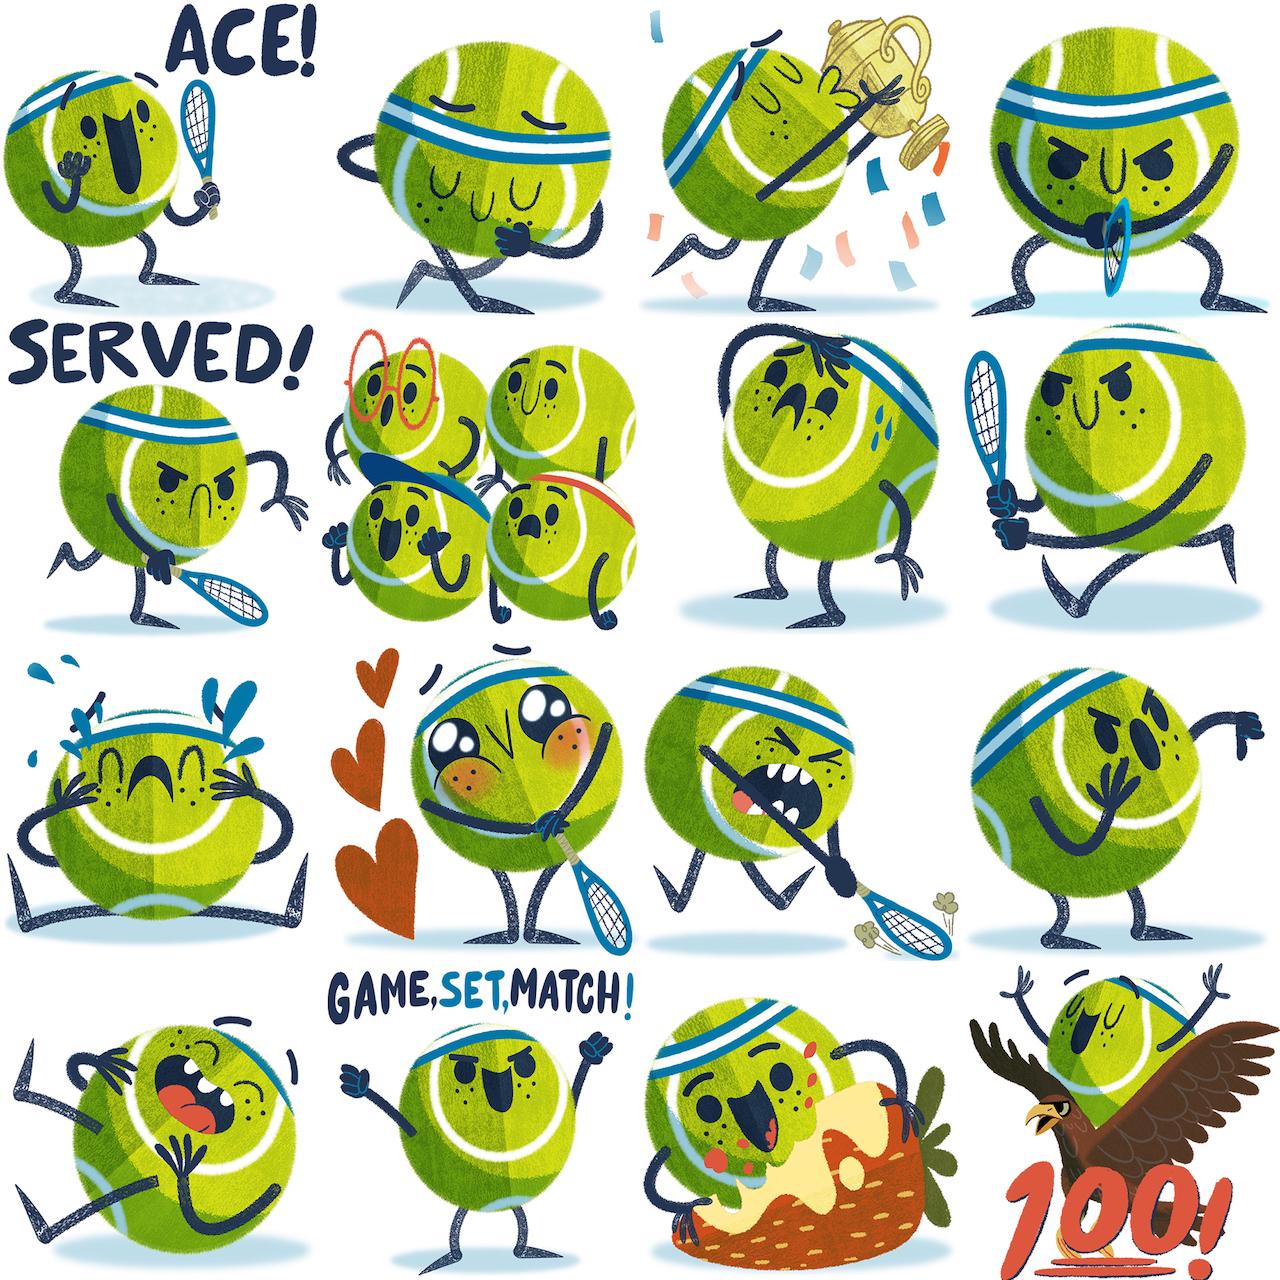 Ace The Tennis Star